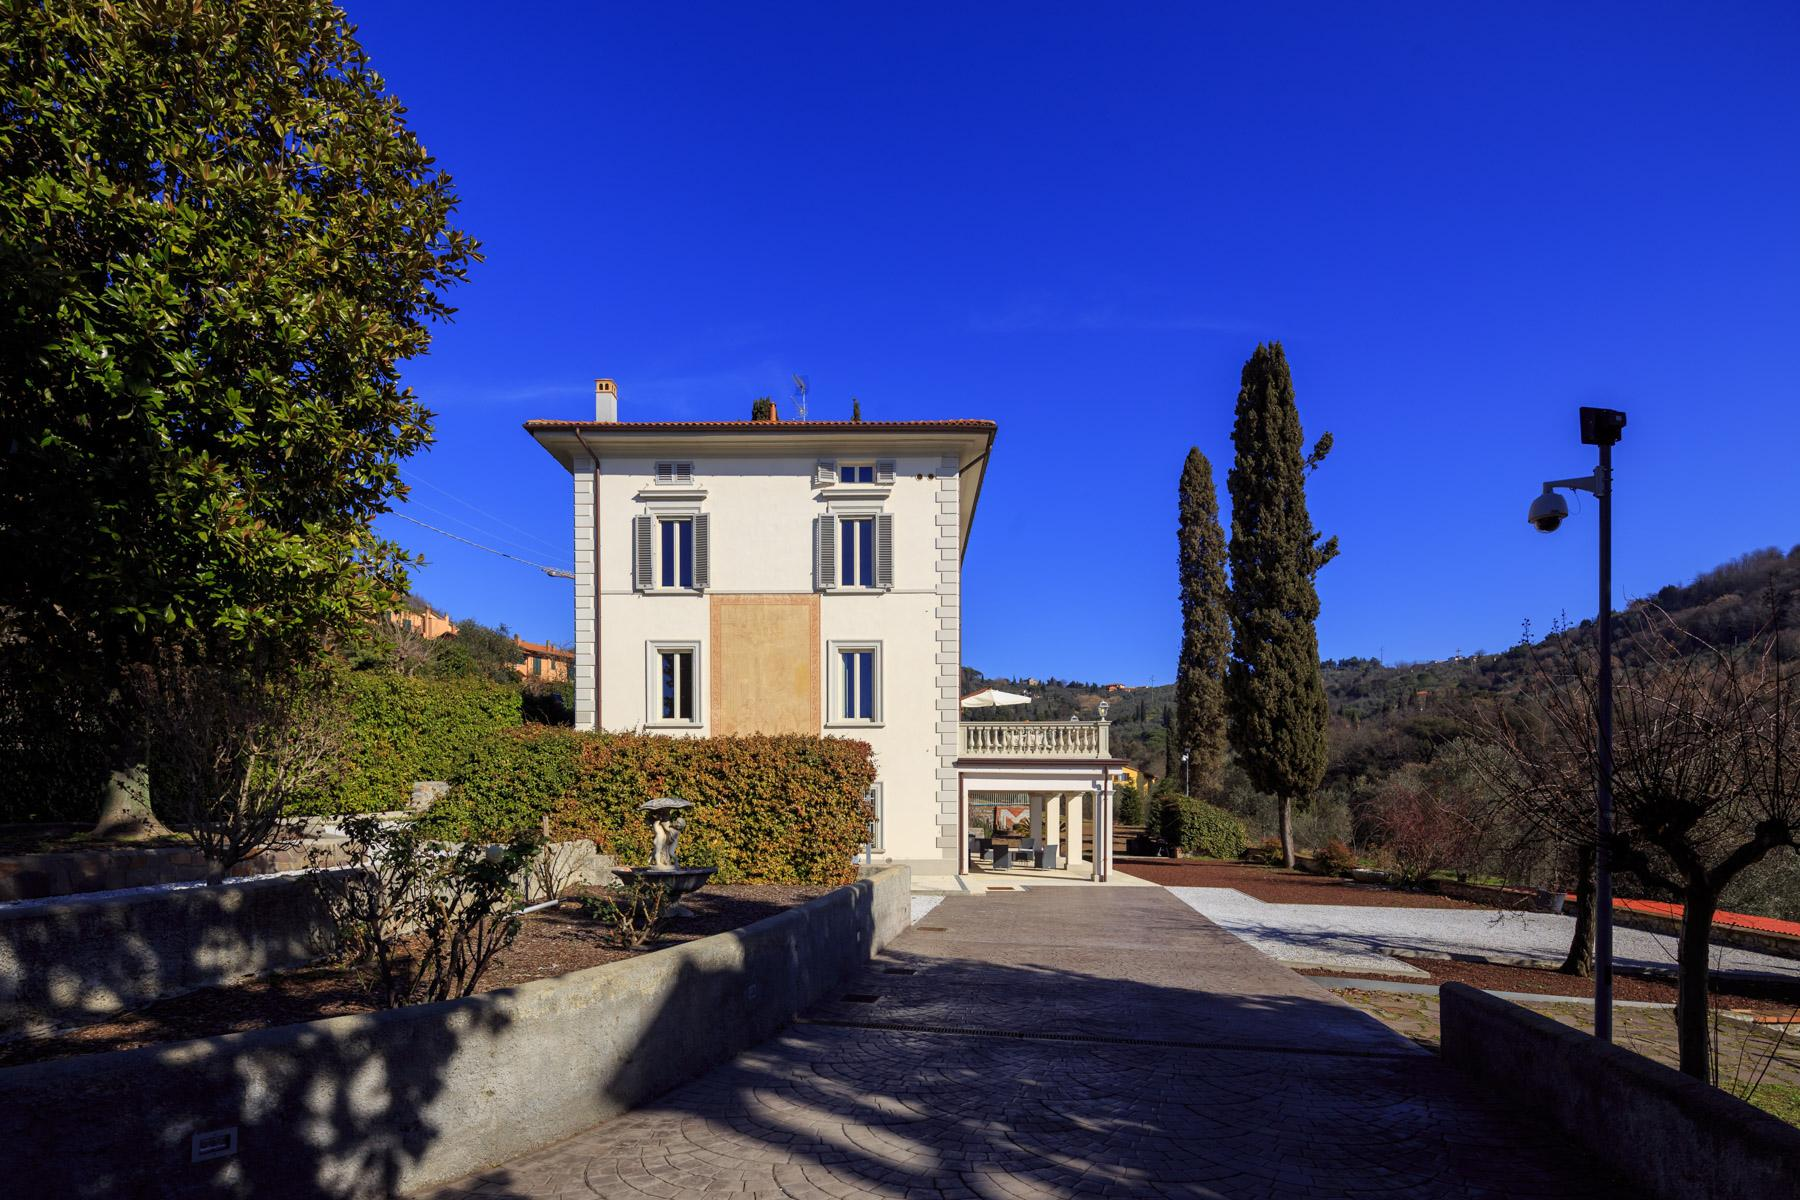 Montecatini Terme小镇优雅的新艺术风格的别墅 - 19